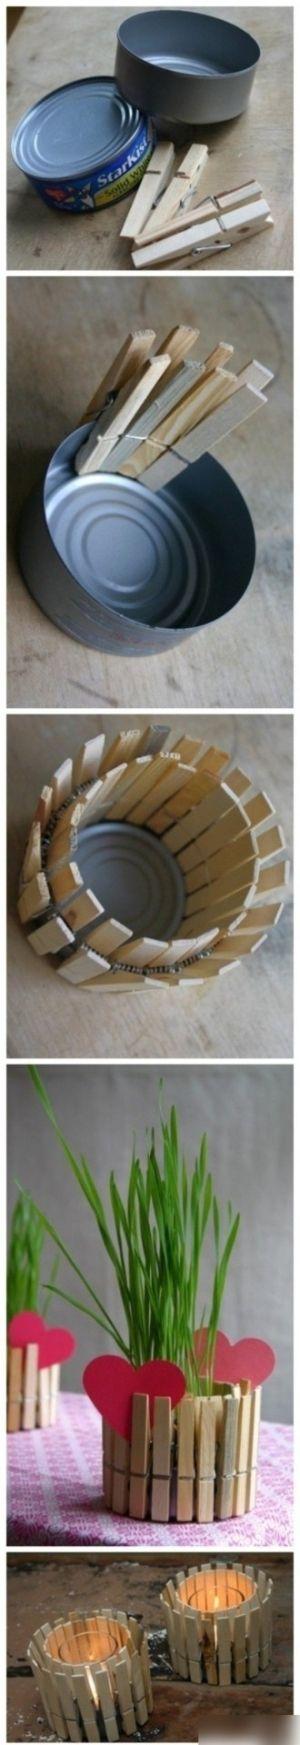 DIY tealight votives by Esbech